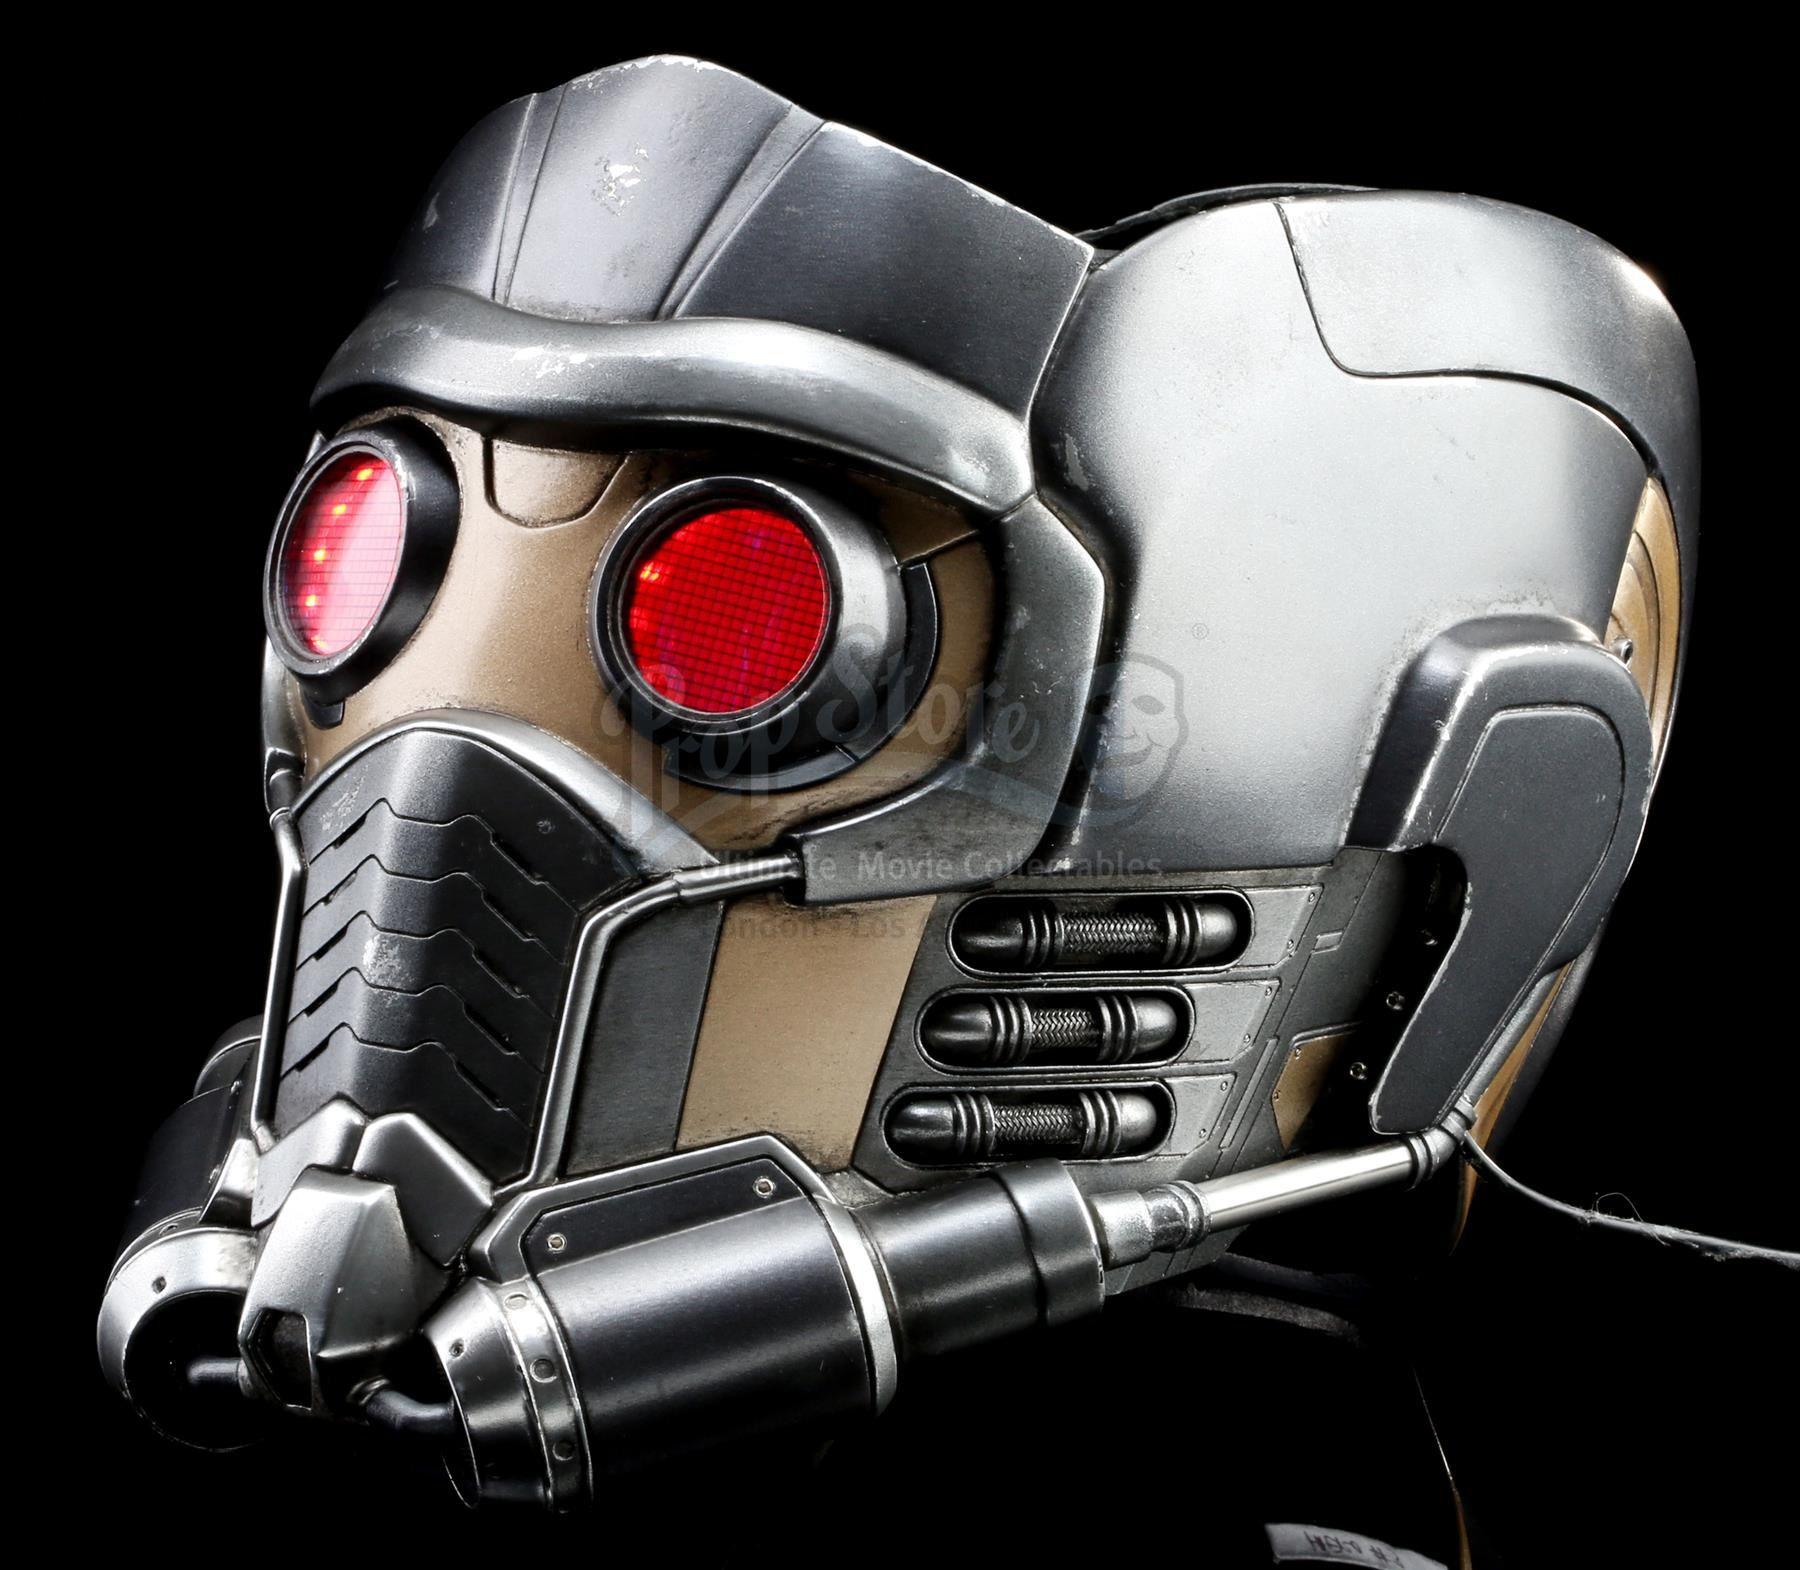 Peter 'Star-Lord' Quill's (Chris Pratt) Hero Helmet